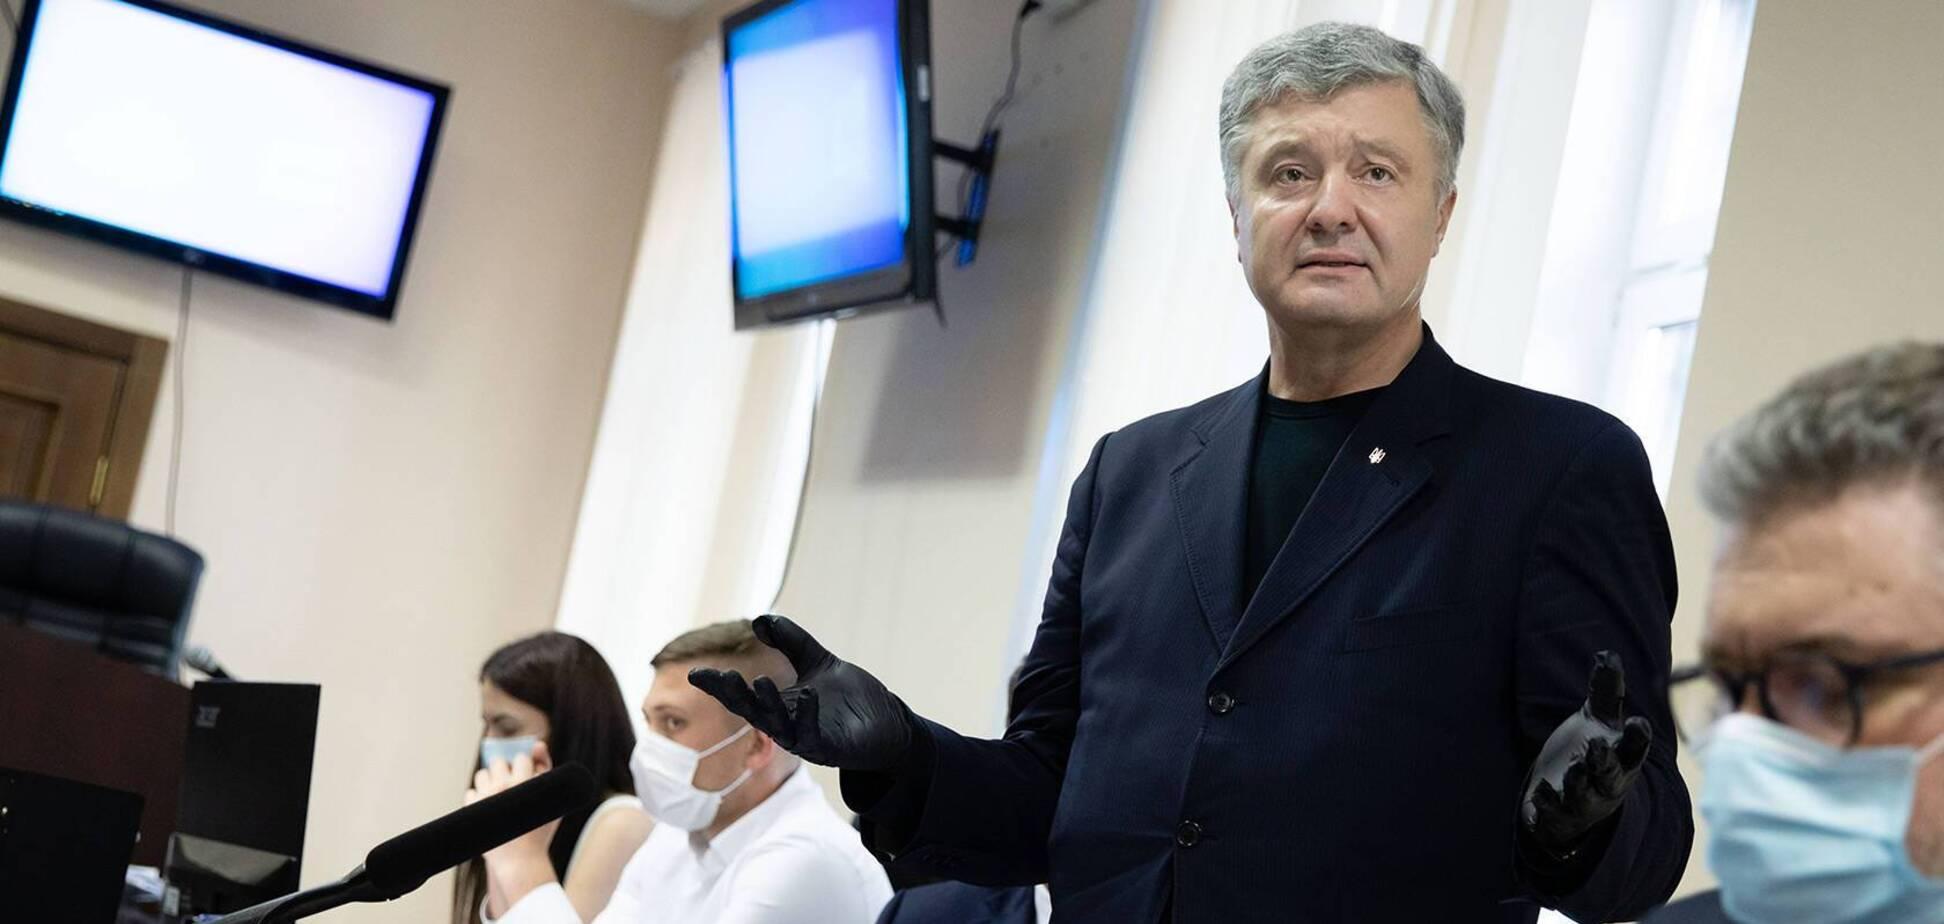 Проти Порошенка відкрили ще чотири справи через ПриватБанк – адвокати